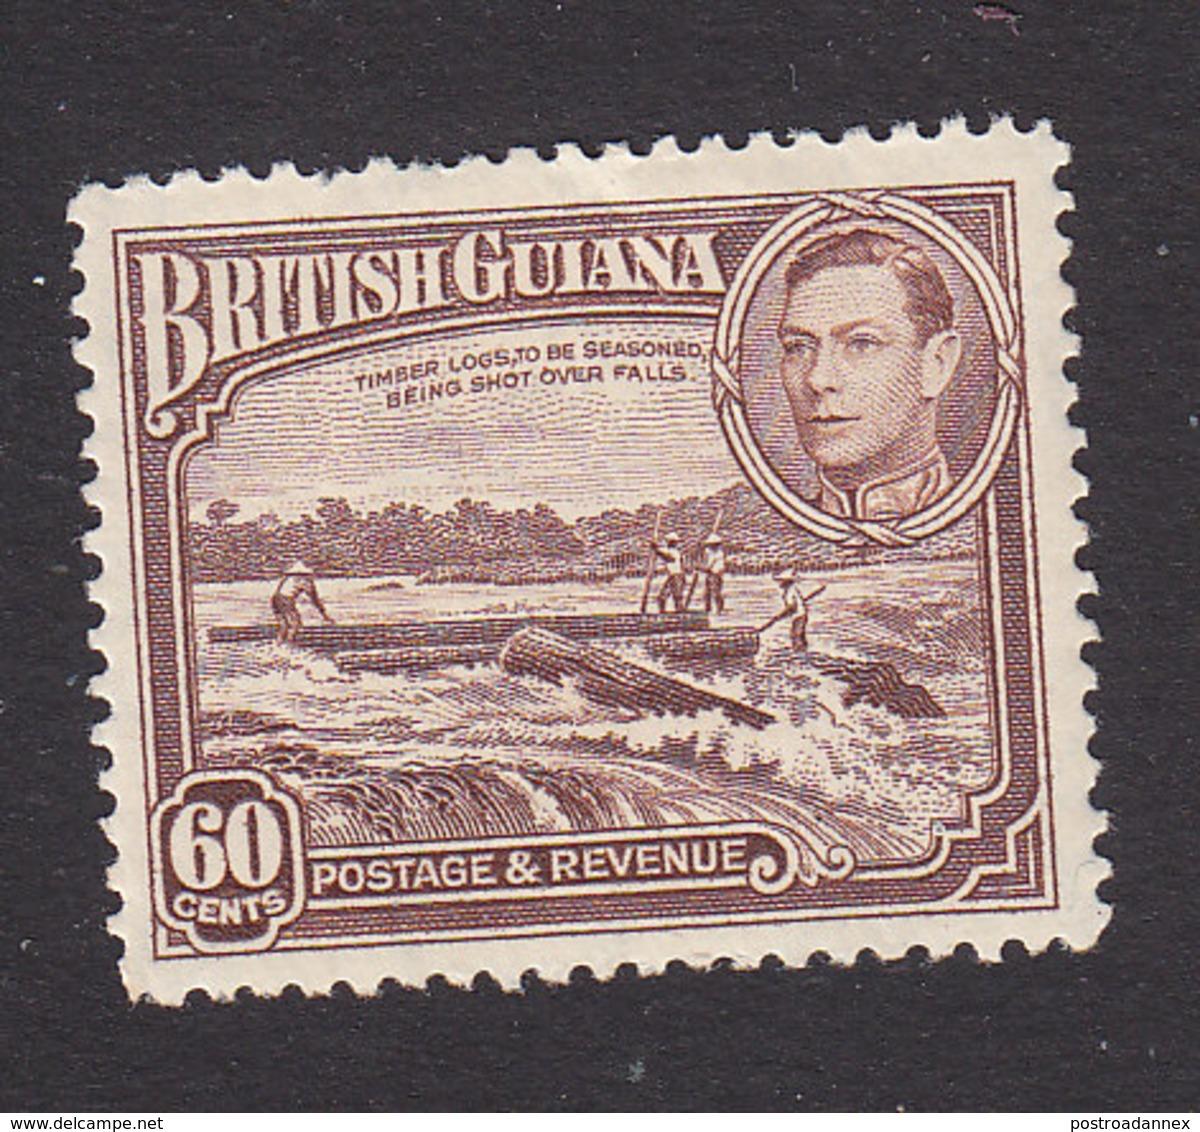 British Guiana, Scott #237, Mint Hinged, Shooting Logs, Issued 1938 - British Guiana (...-1966)